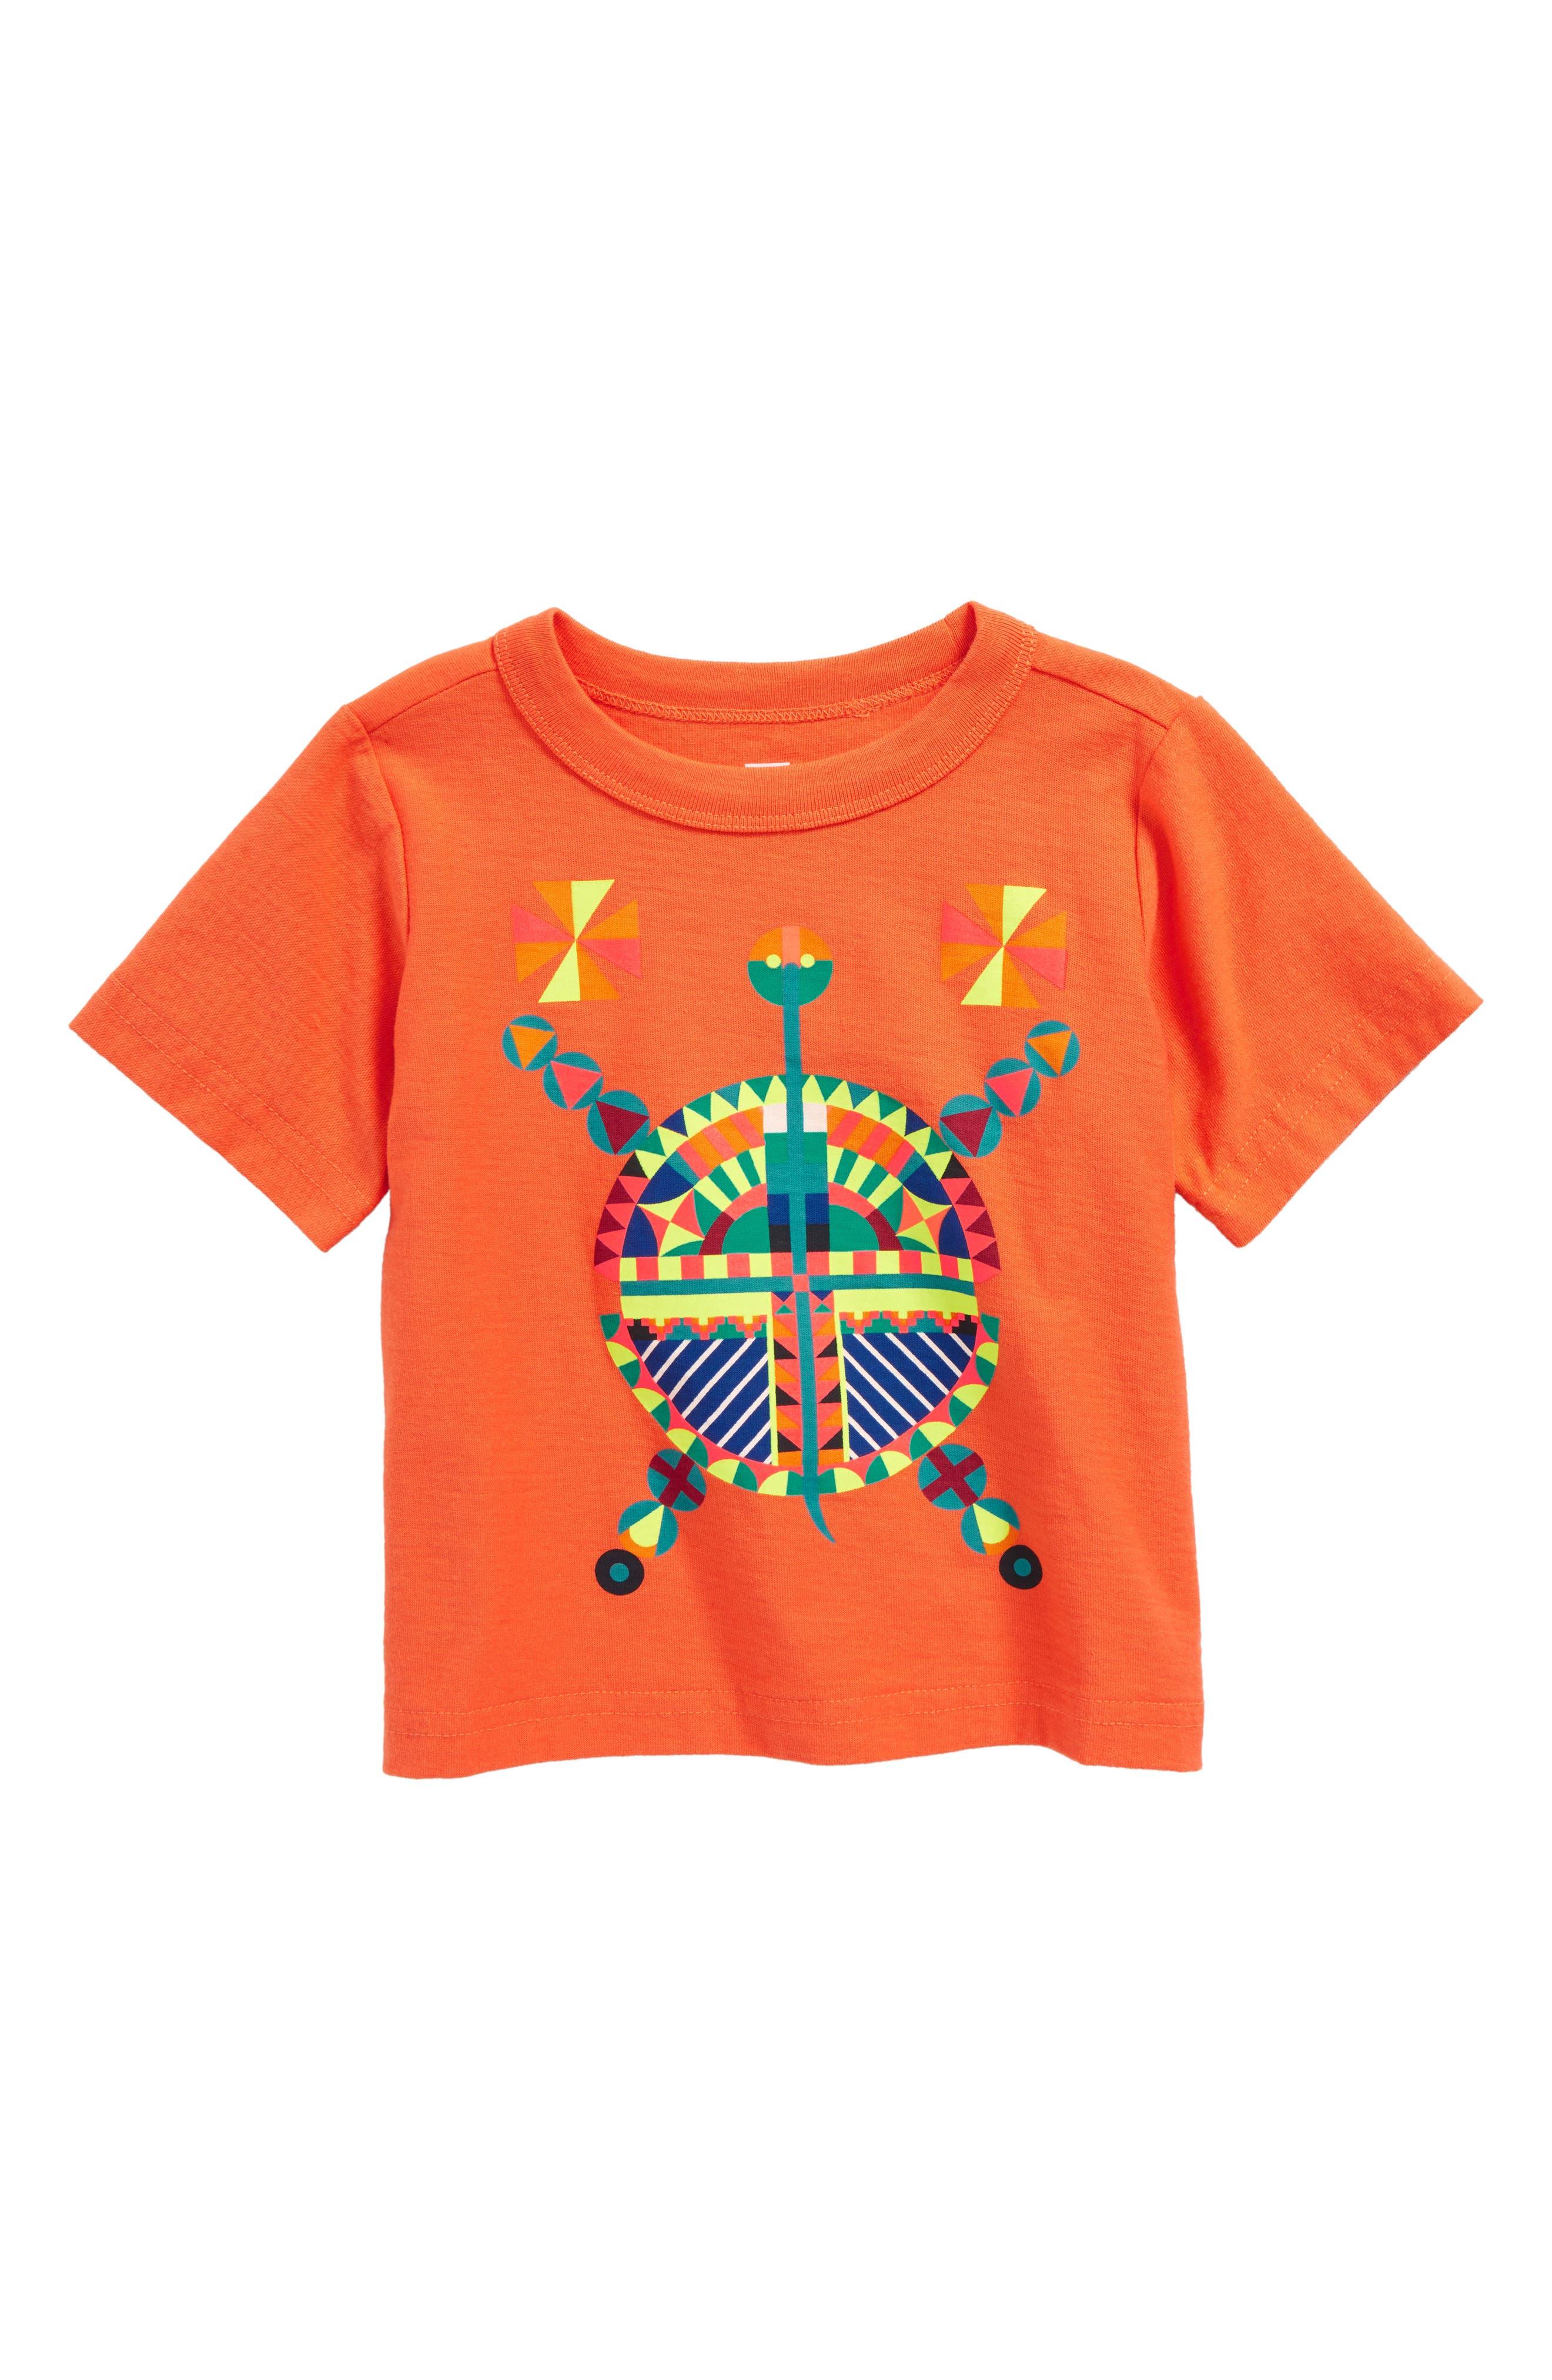 Main Image - Tea Collection Thunder Bringer Graphic T-Shirt (Baby Boys)